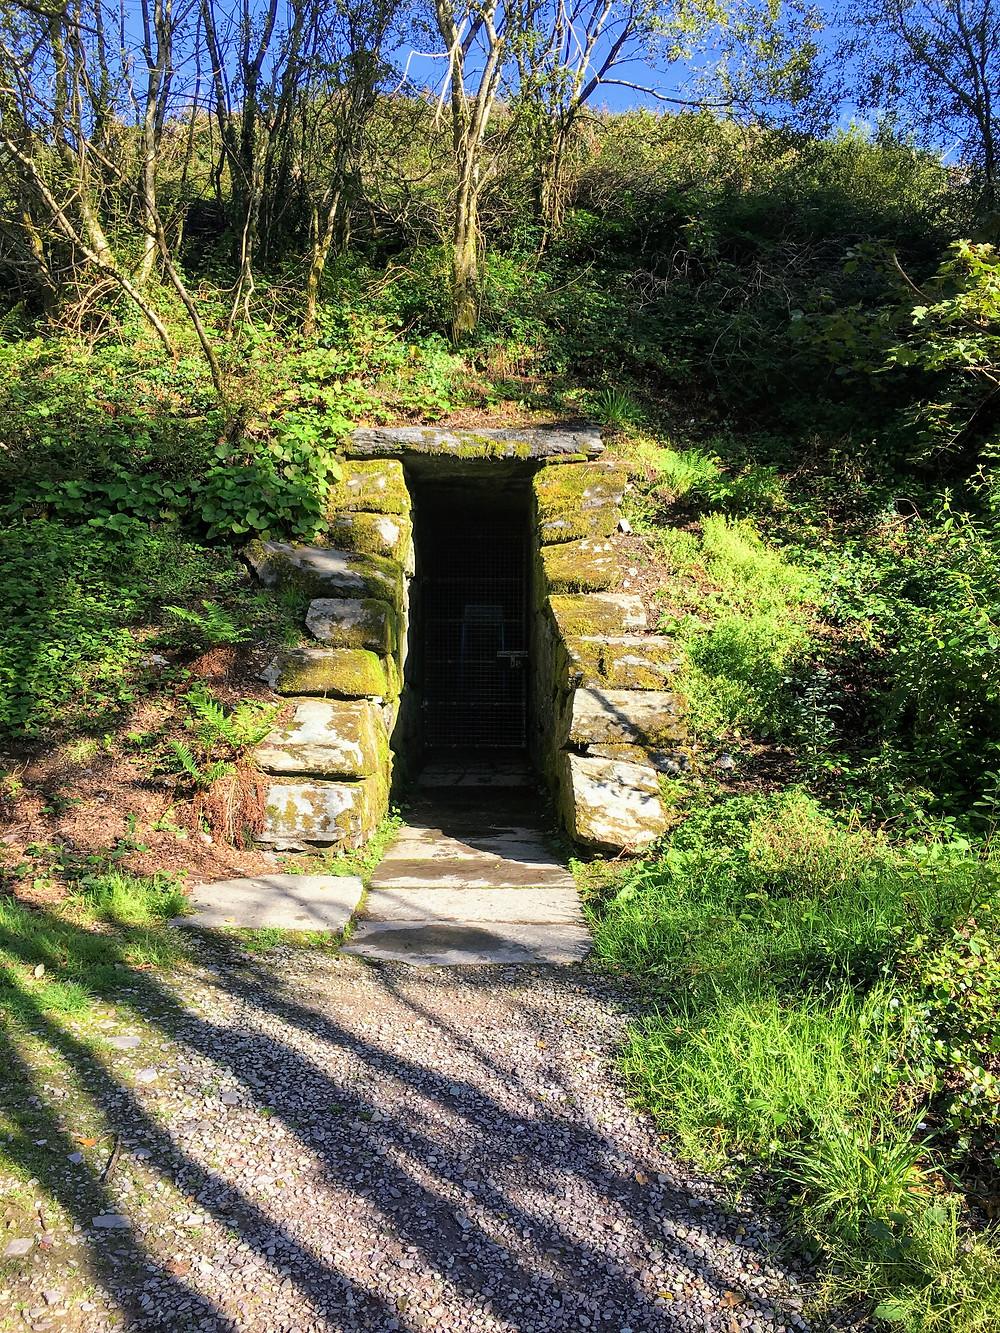 James Turrell Sky Garden in Russagh, County Cork, Ireland, art installation entrance